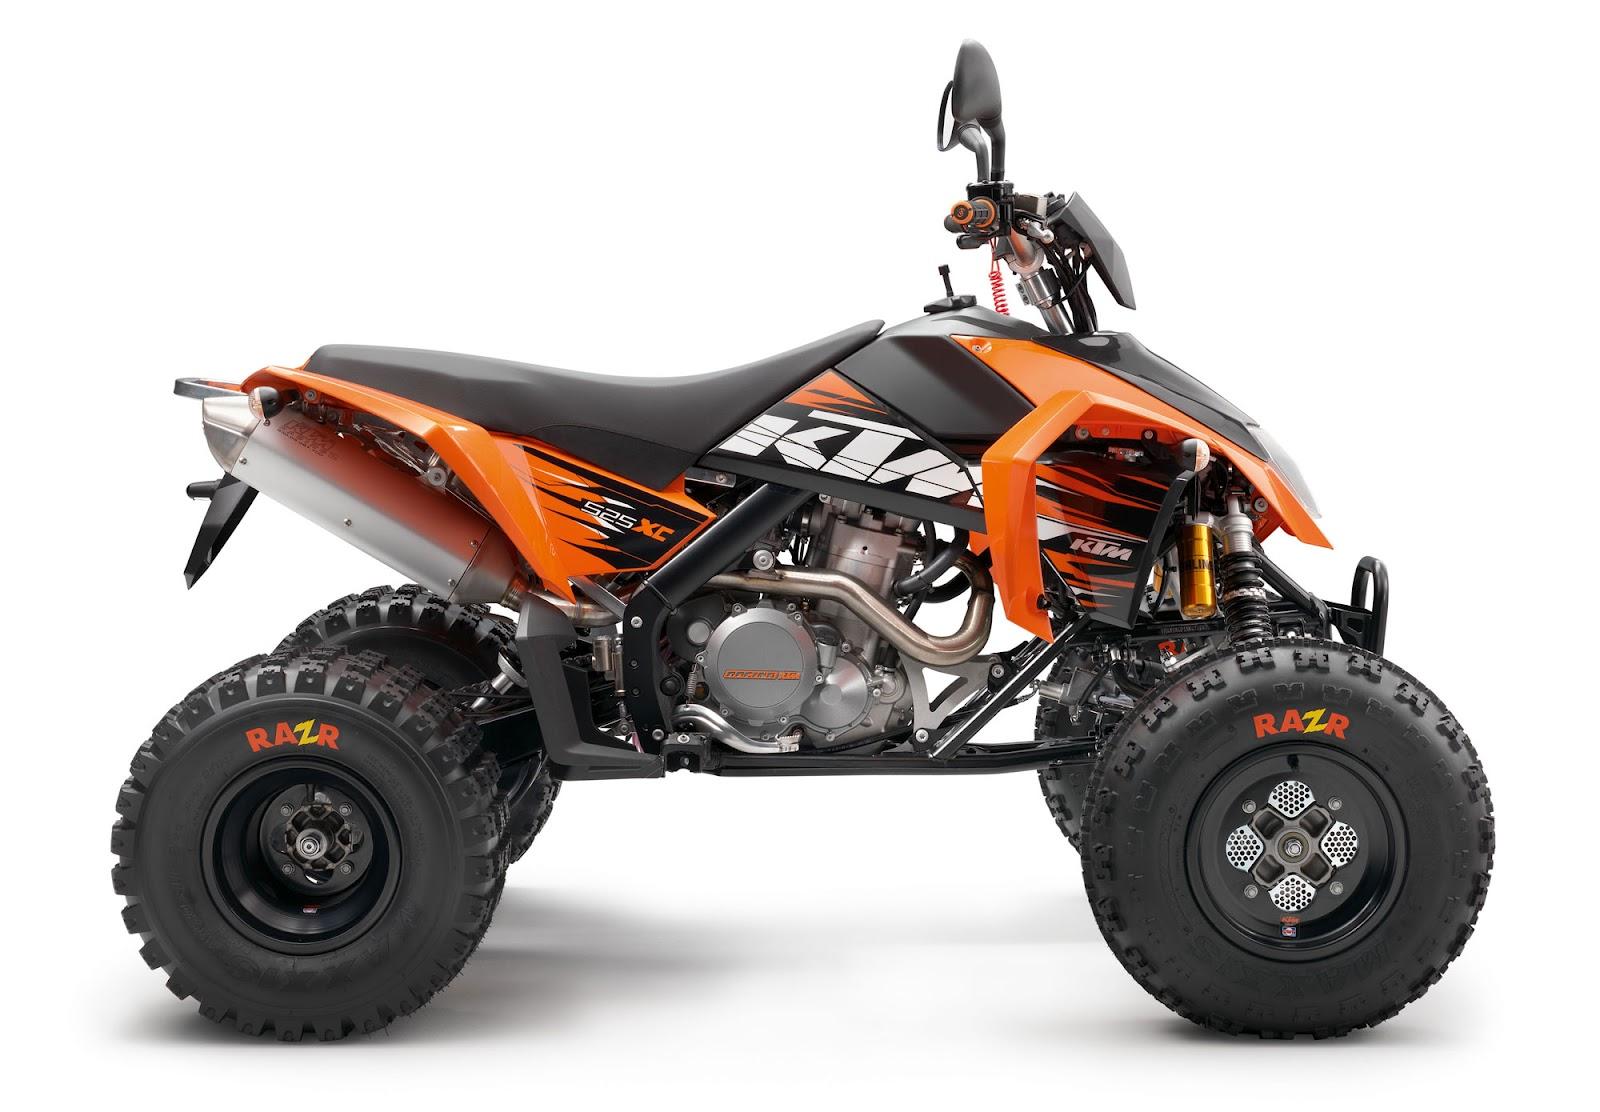 http://3.bp.blogspot.com/-hl1v51jOilY/T4CKQVeP93I/AAAAAAAABAM/QNcdXg8OvW8/s1600/KTM+525XC+ATV+2012+ATV+Pictures+01.jpg